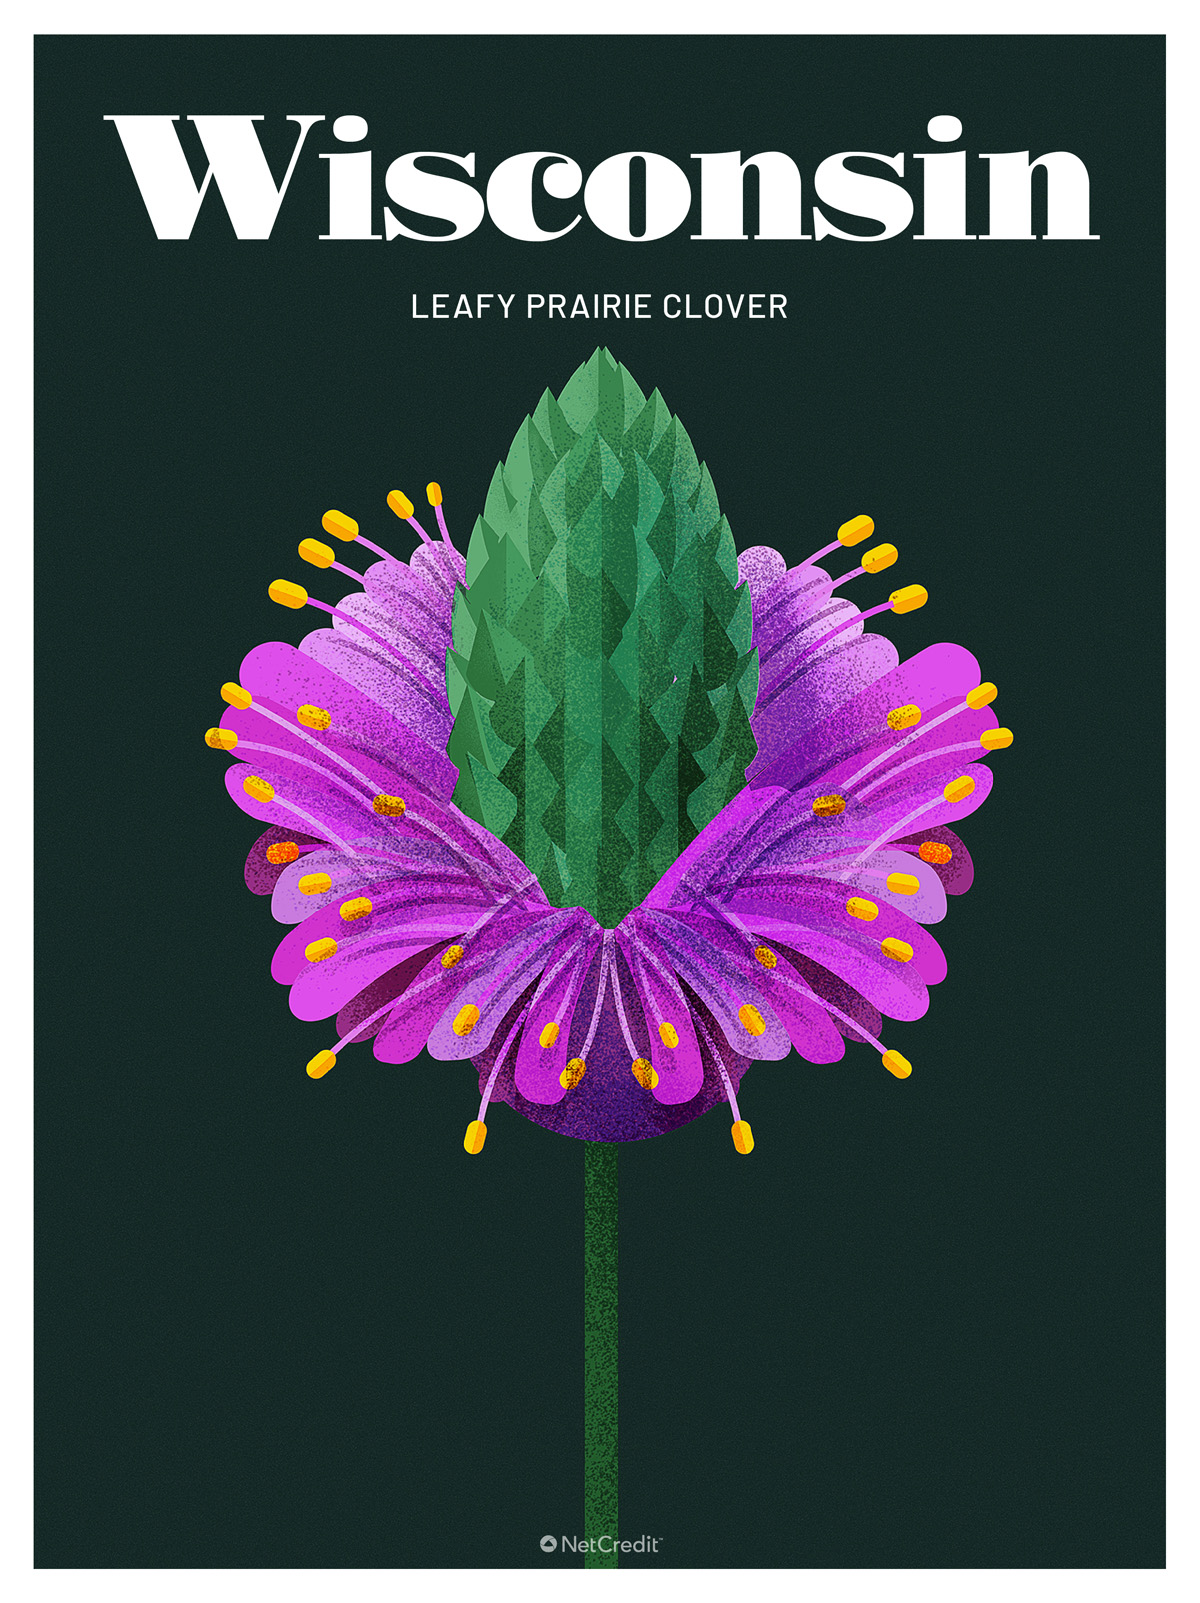 Endangered Plant in Wisconsin: Leafy Prairie Clover